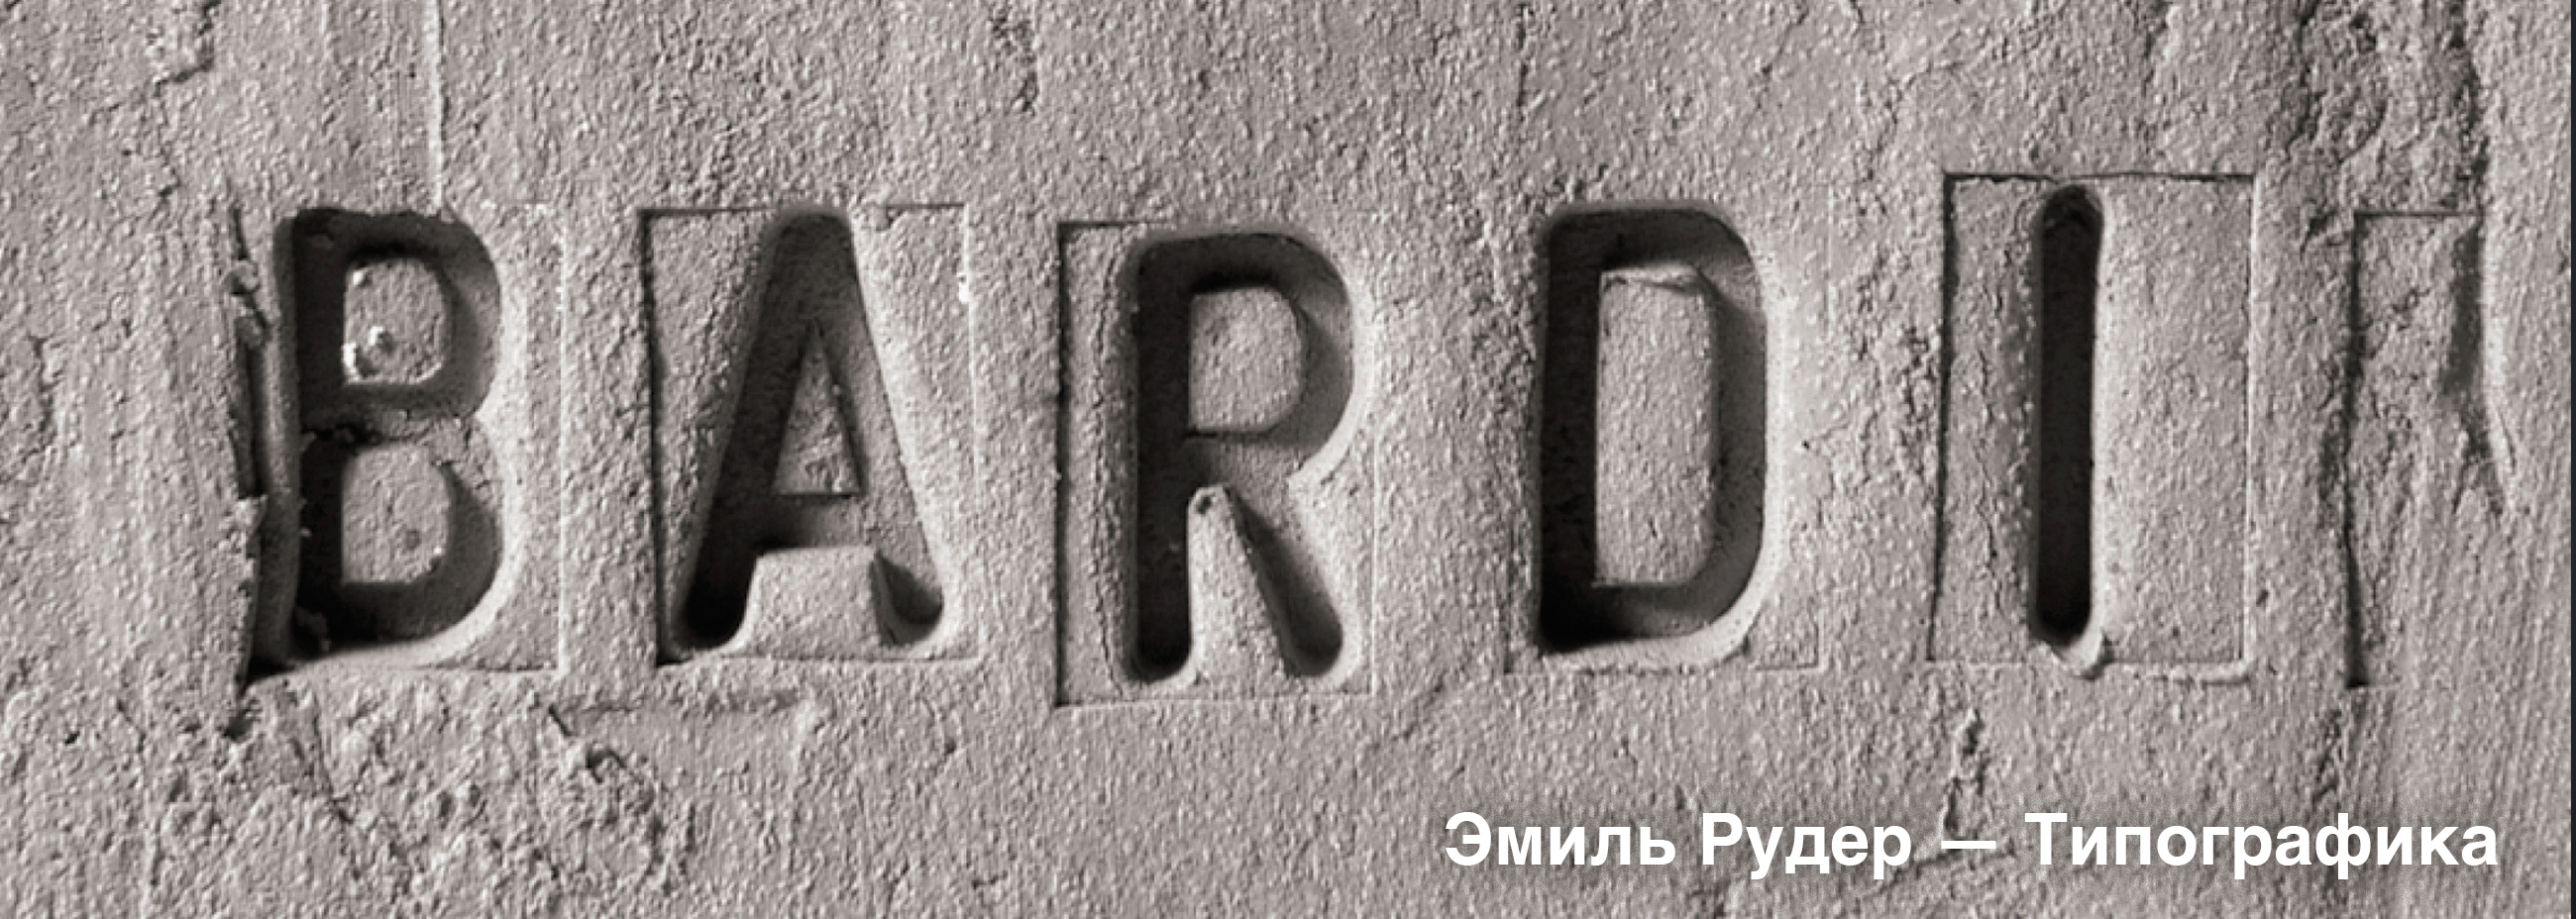 Эмиль Рудер — «Типографика»